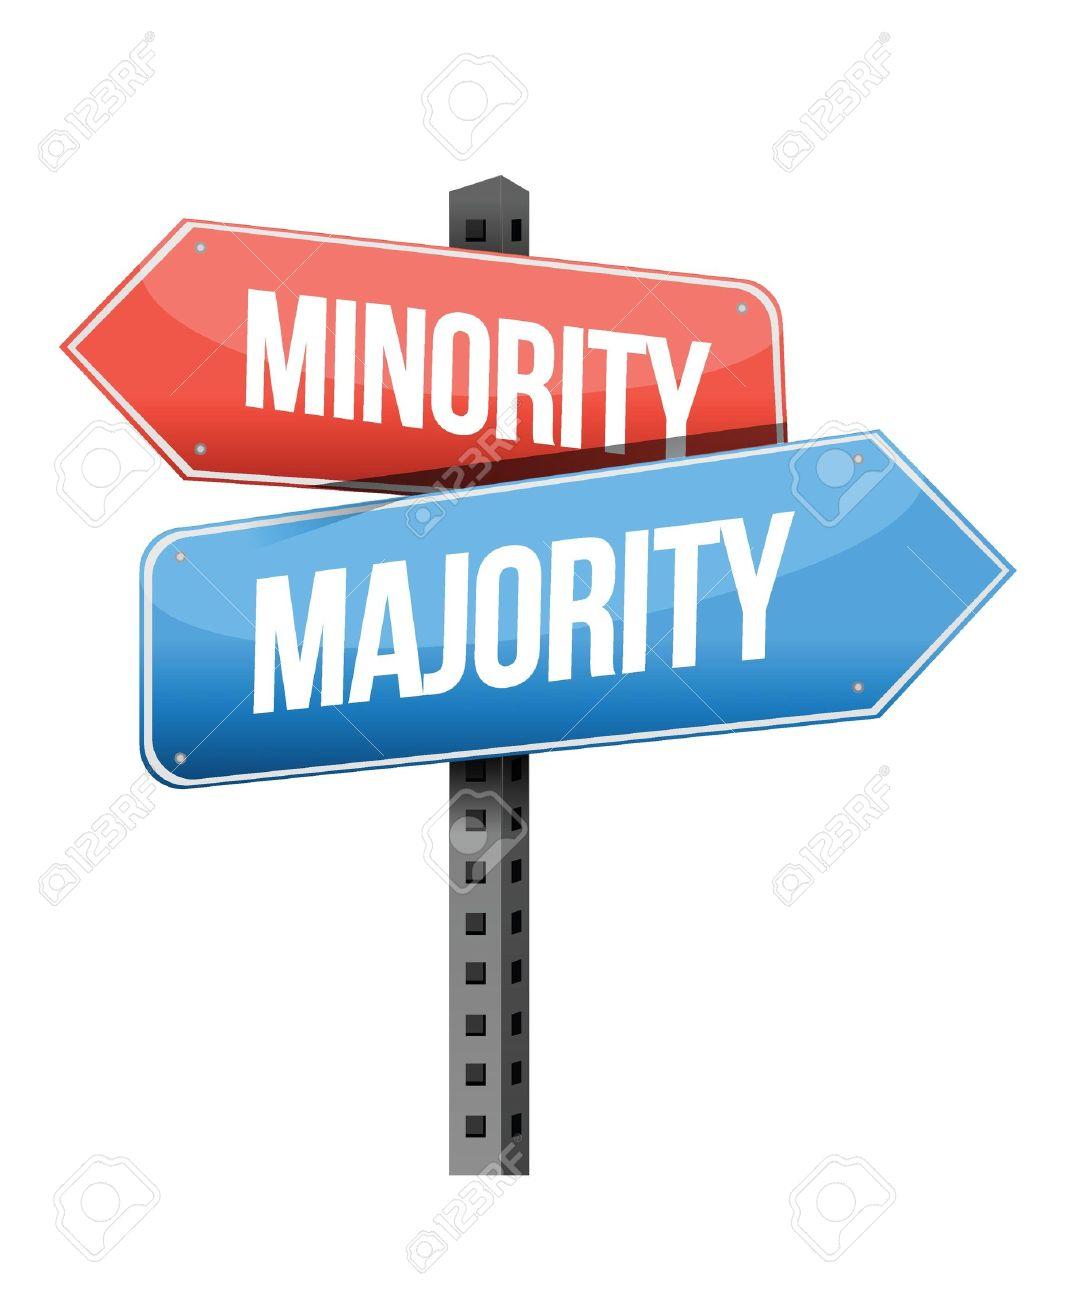 857 Minority Cliparts, Stock Vector And Royalty Free Minority.